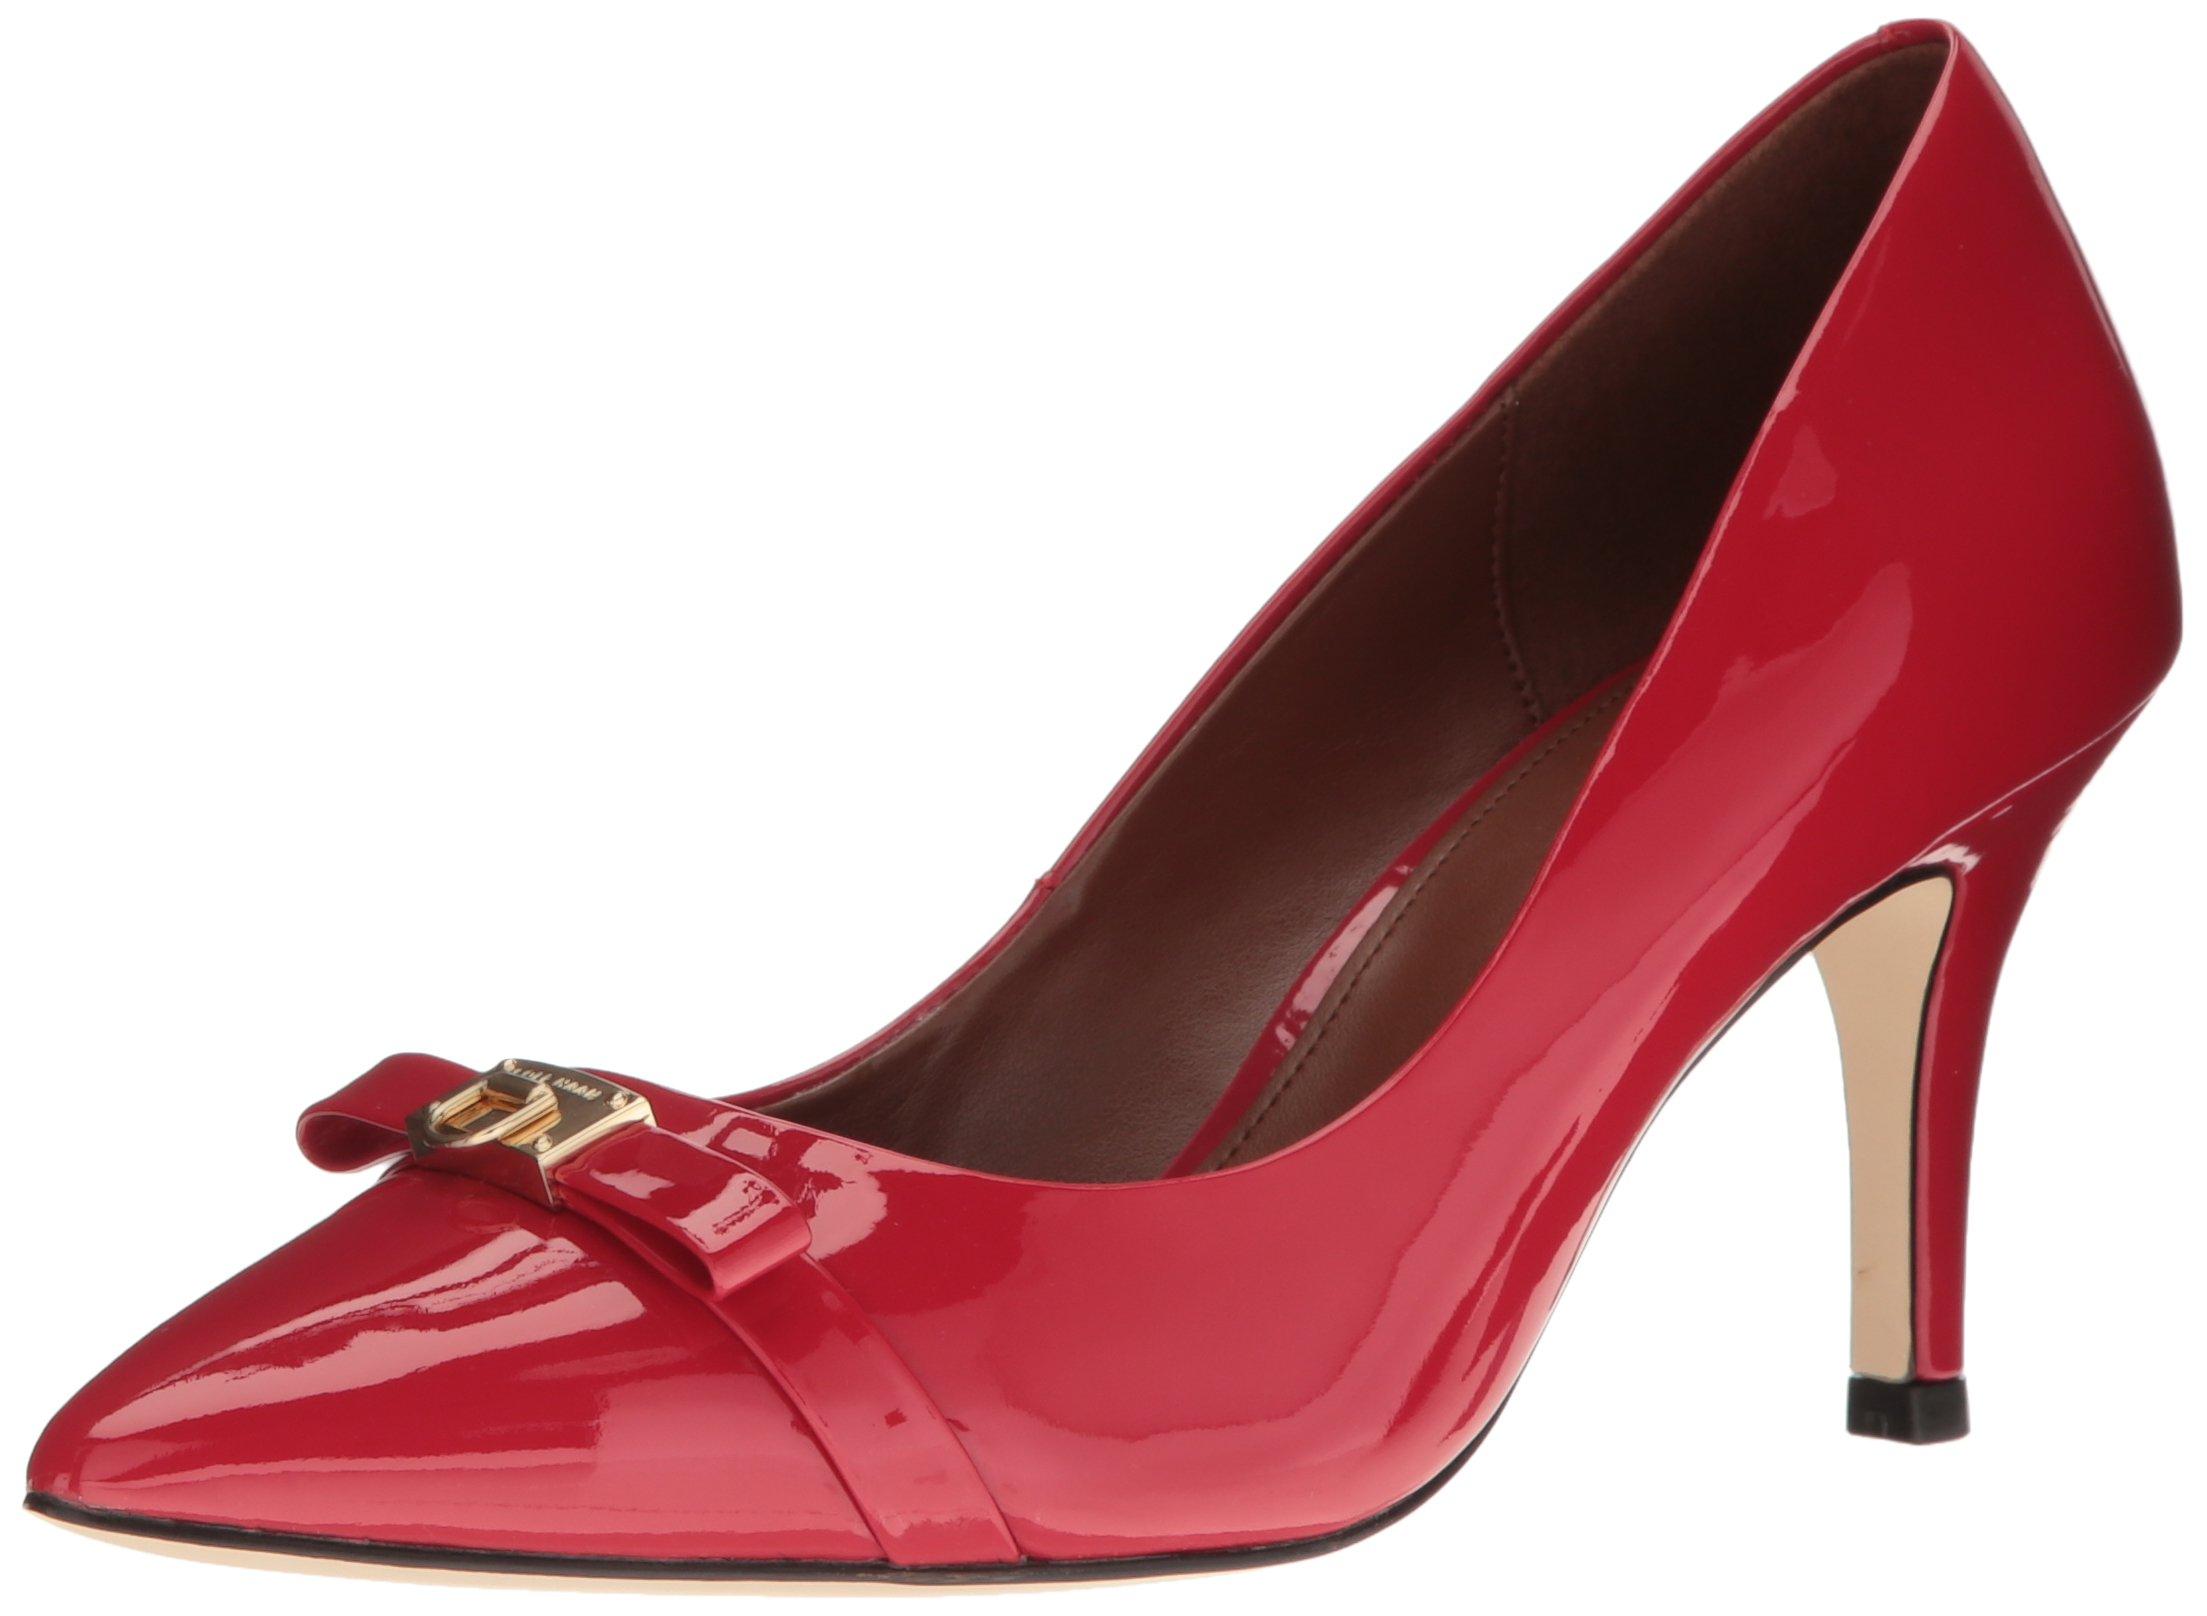 Cole Haan Women's Juliana Detail Dress Pump, Tango Red Patent, 9 B US